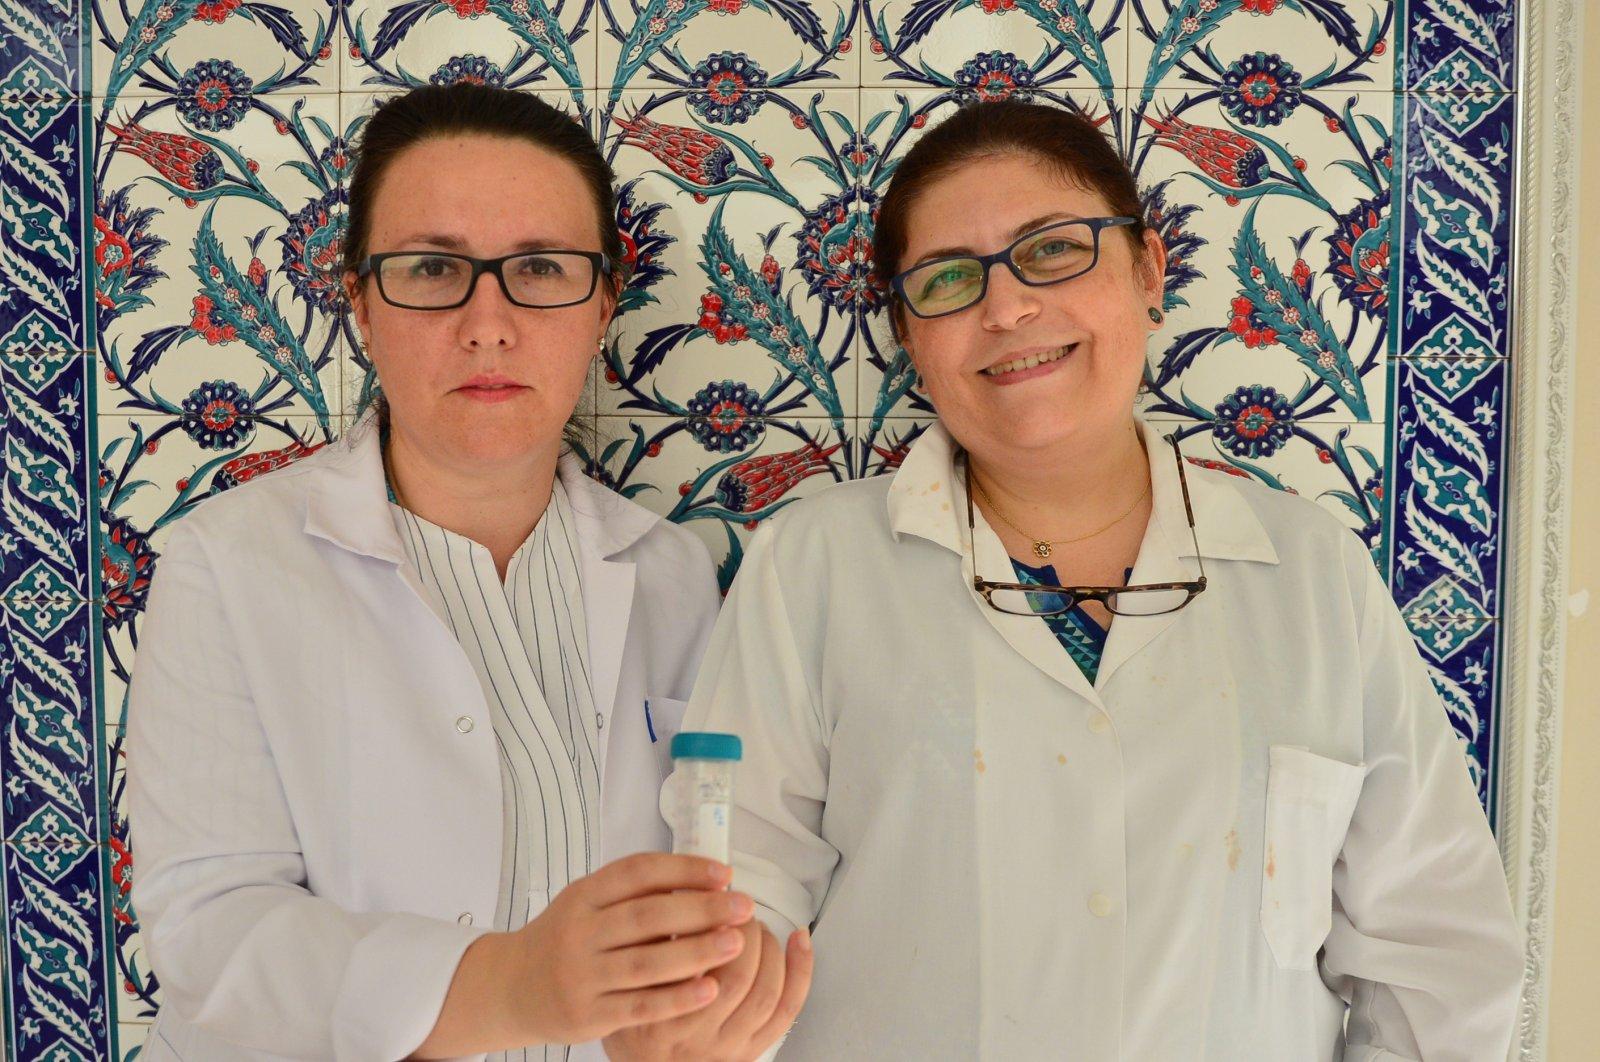 Researchers Dilvin Ipek (L) and associate professor Nükhet Zorba pose with the disinfectant they created at Çanakkale Onsekiz Mart University, July 24, 2020. (AA Photo)